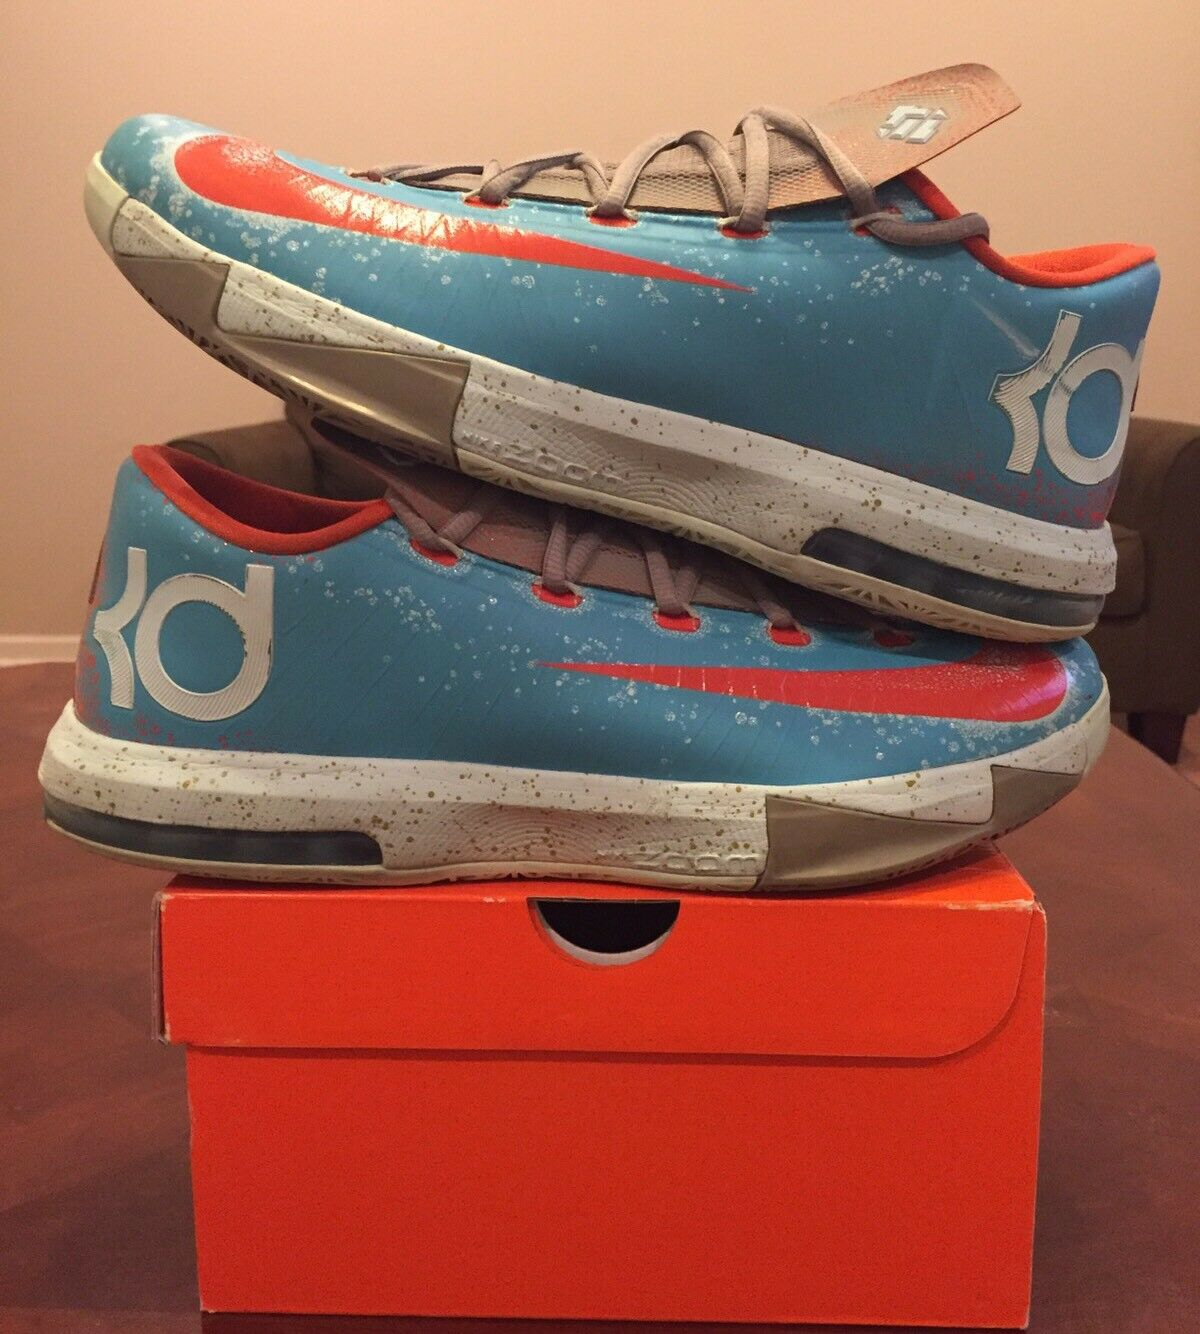 Nike Zoom Kd 6 Vi bluee Crab N7 Red Nerf Energy Splatter What Maryland 1 2 3 4 5